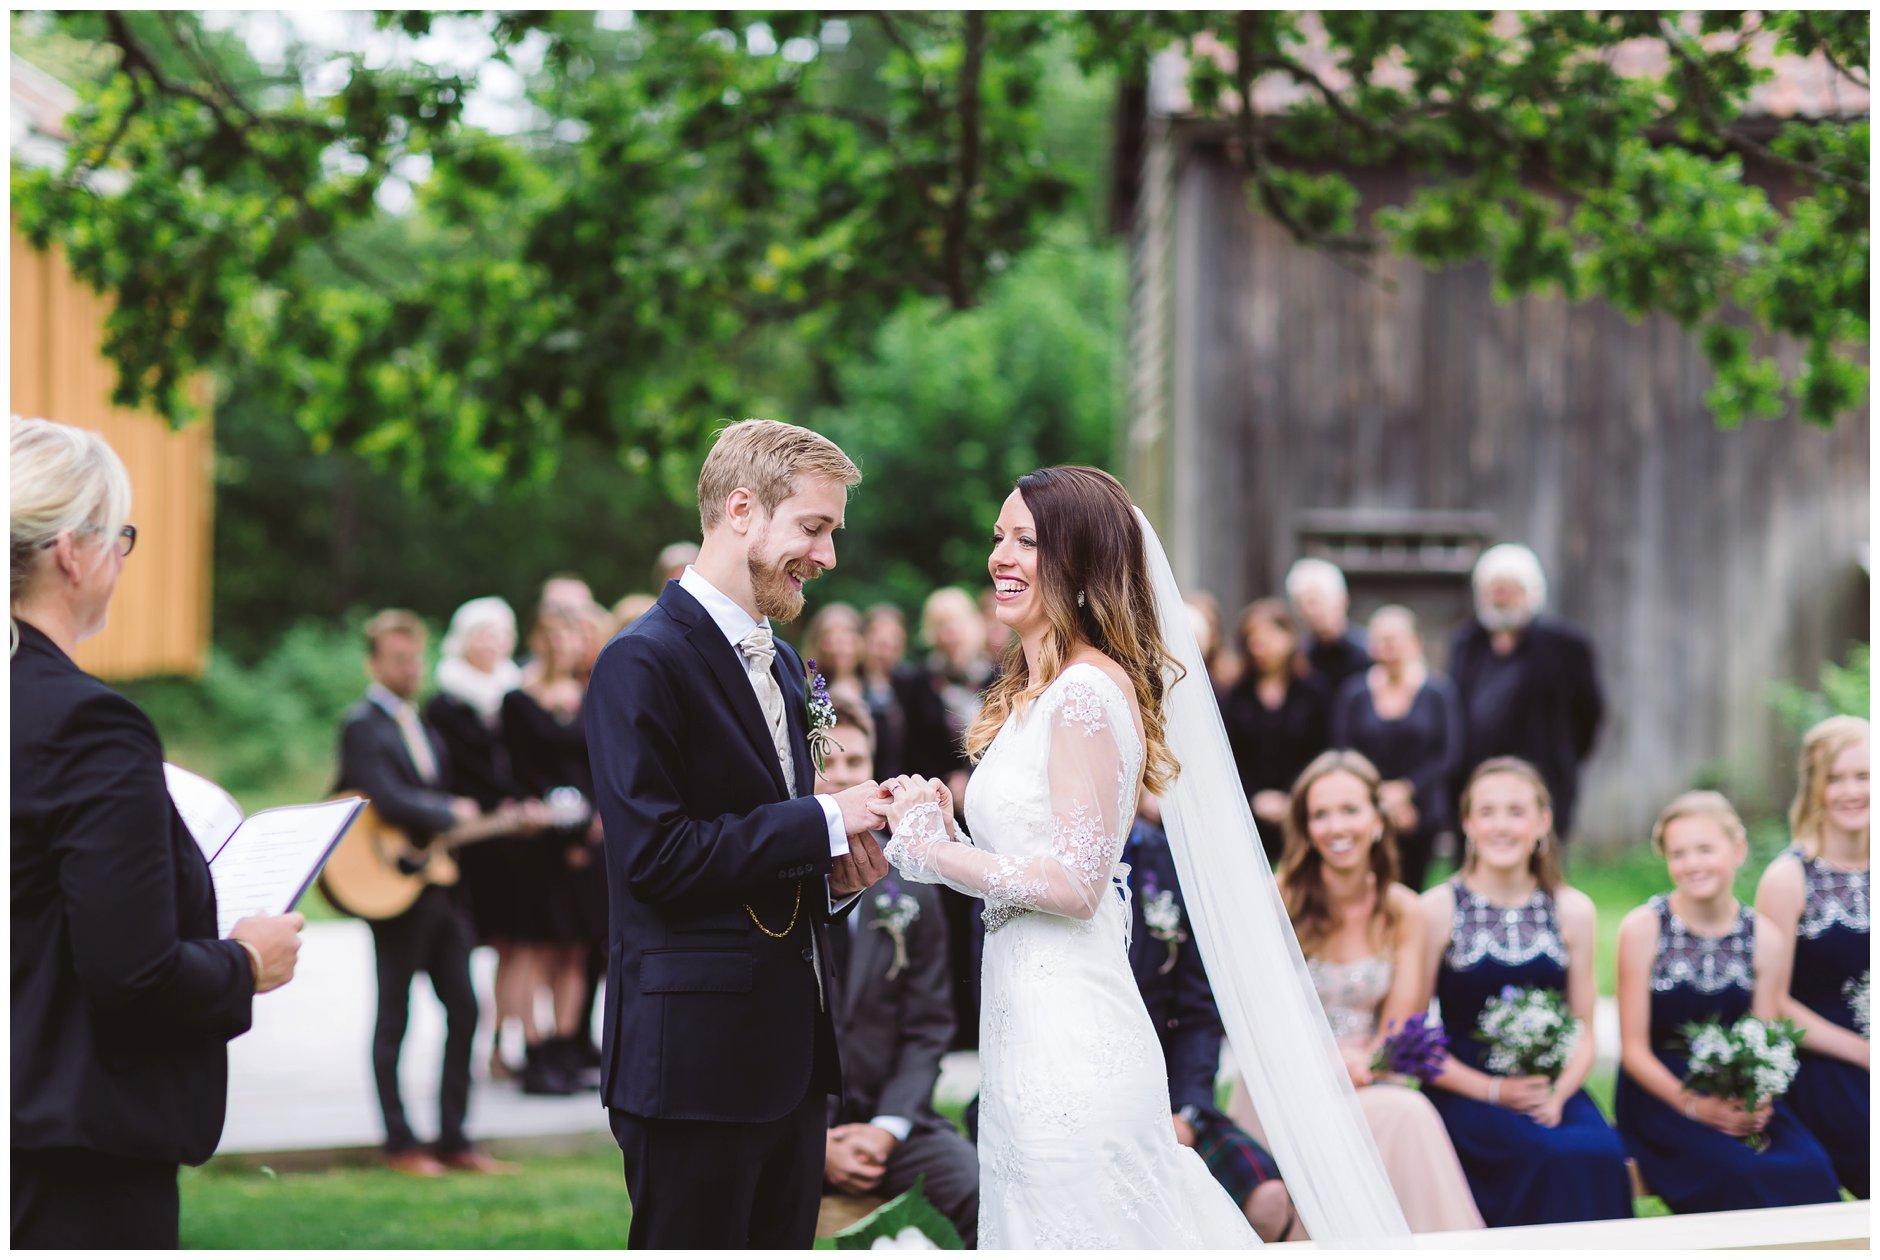 Glennewedding bryllup på Glenne Gård